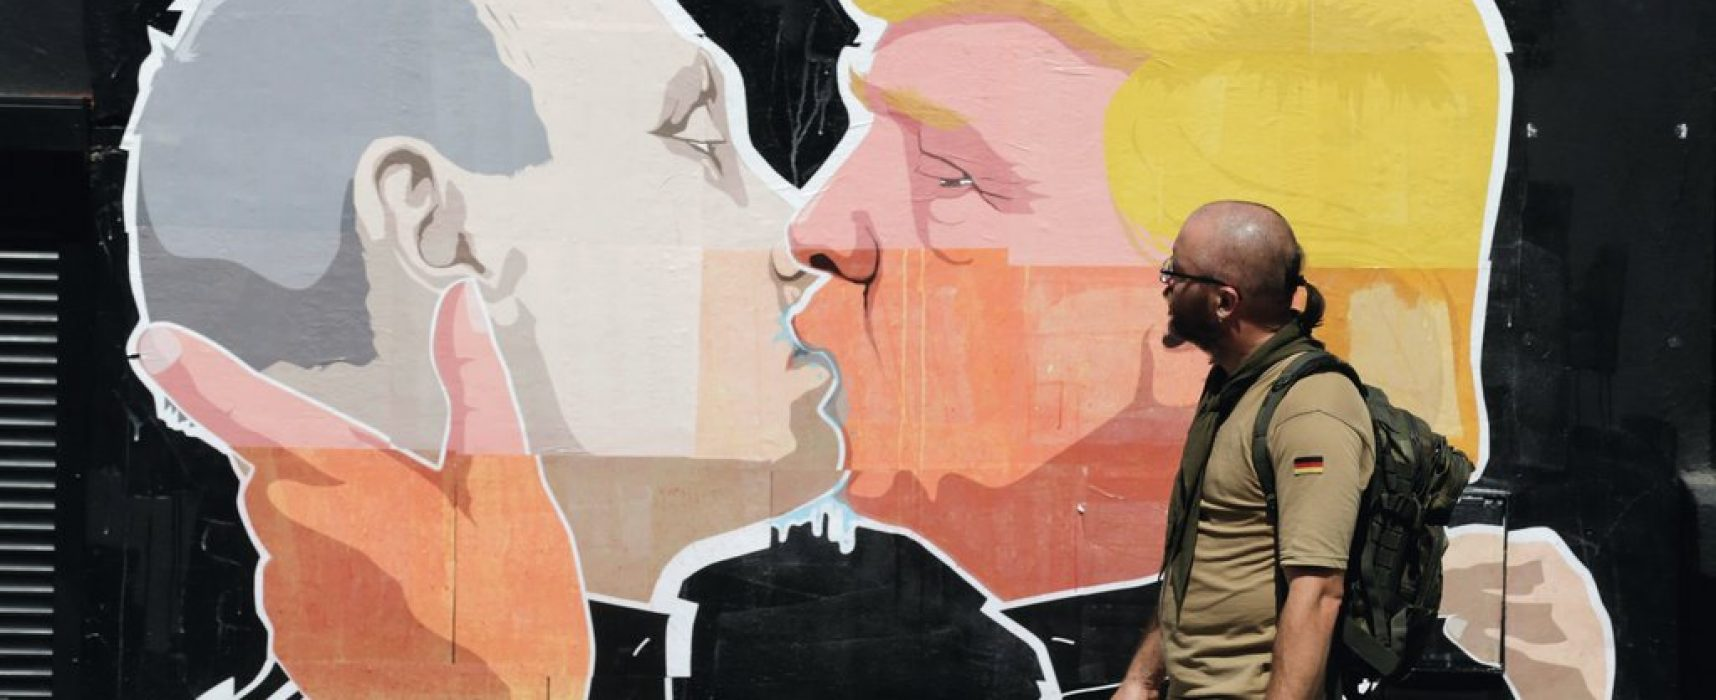 Ucraina, ennesima tregua